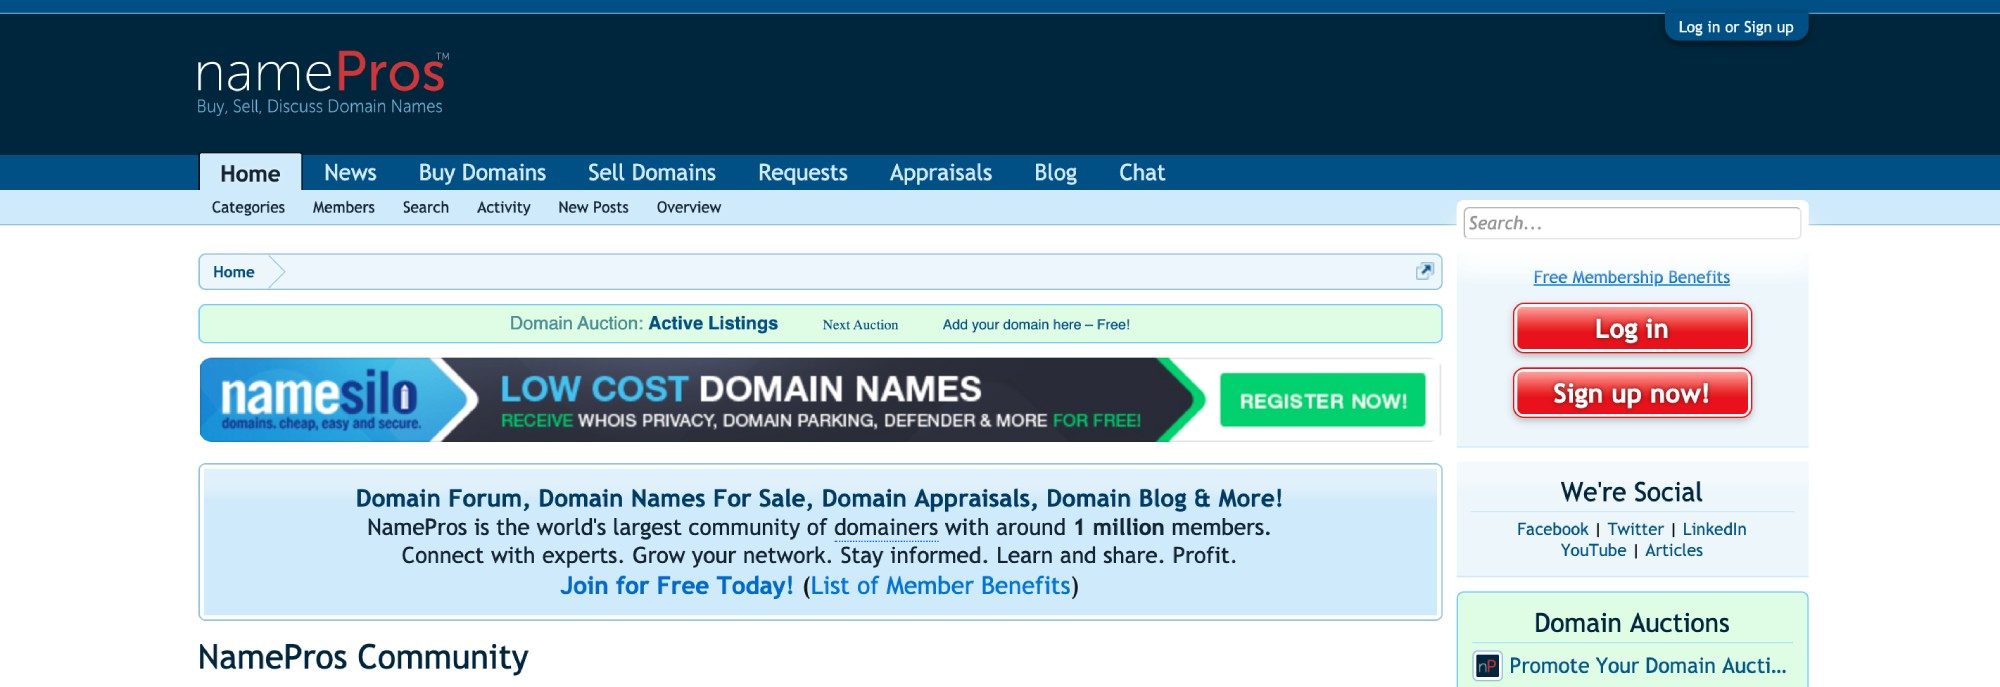 The NamePros website.